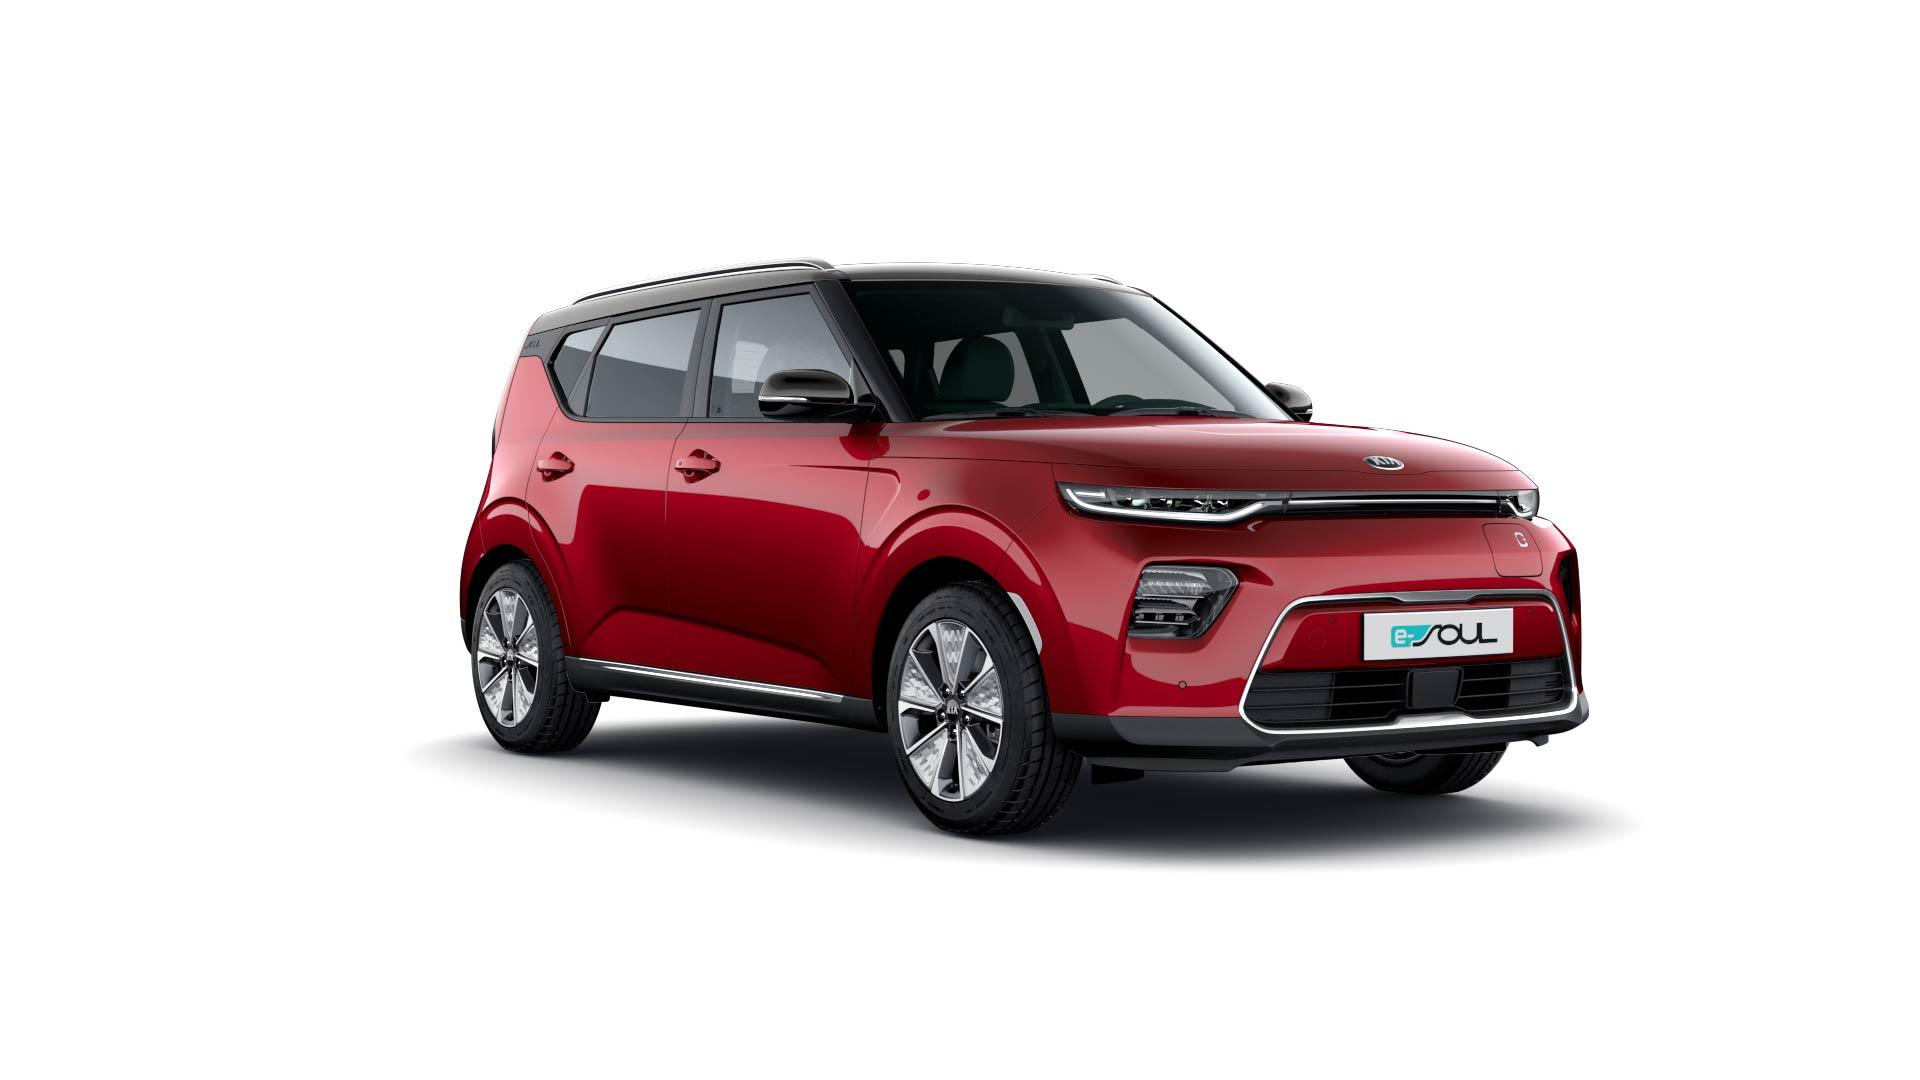 Kia e-Soul Seitenansicht Rot Elektro Auto Stahl